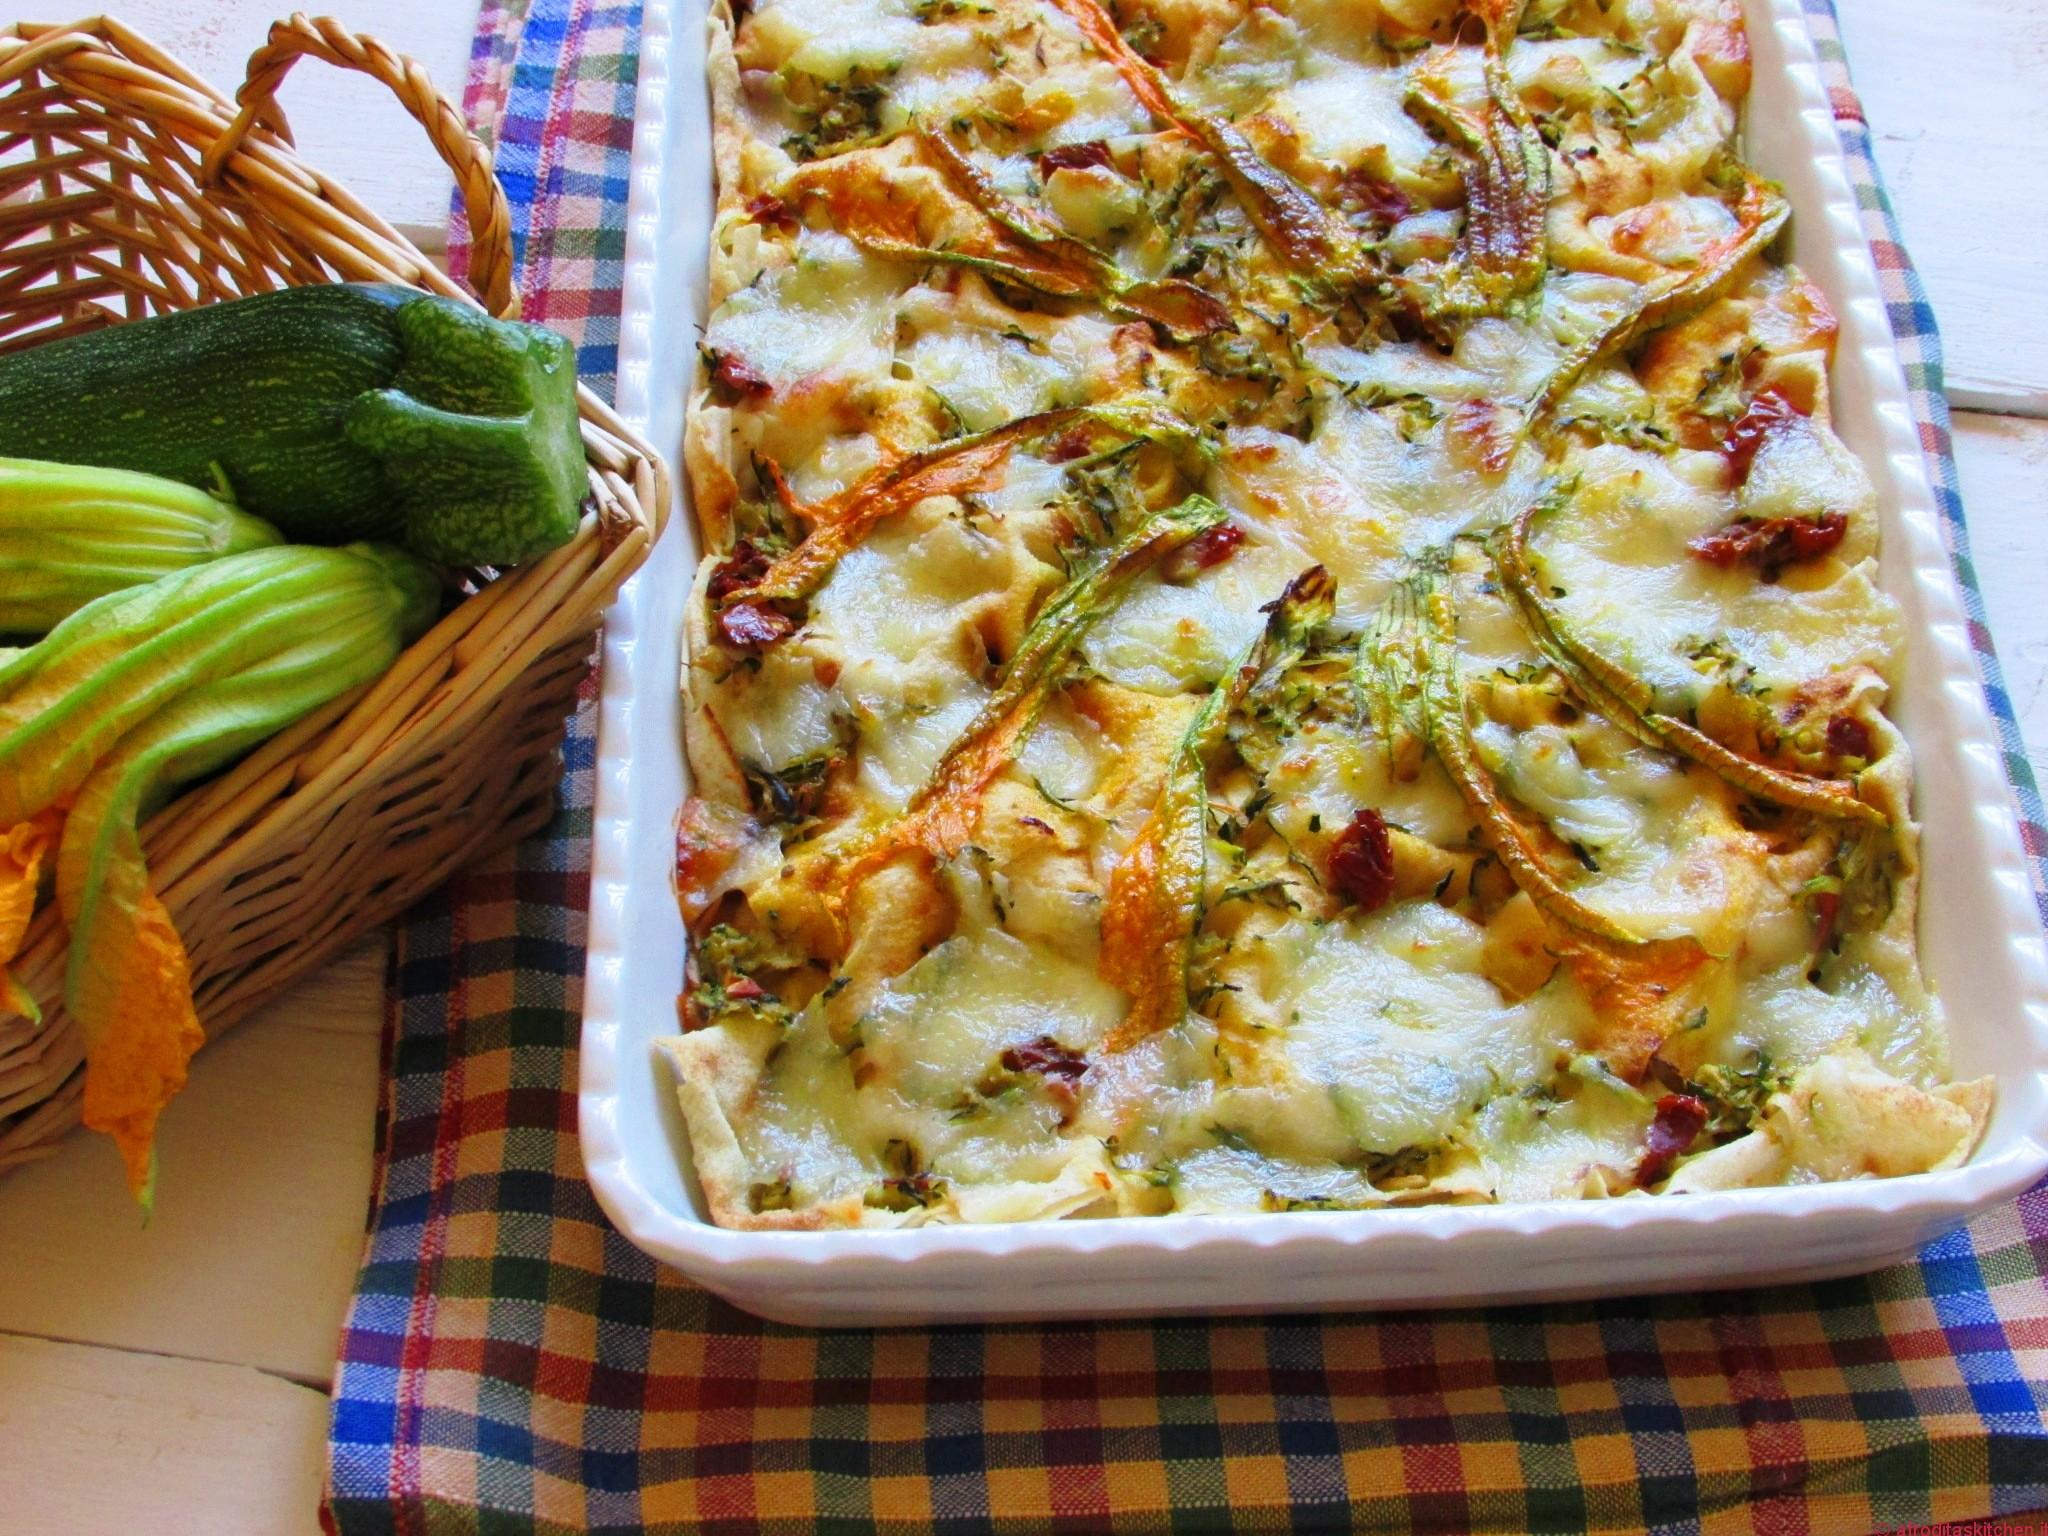 Lasagne di pane carasau con zucchine pomodori secchi e scamorza affumicata